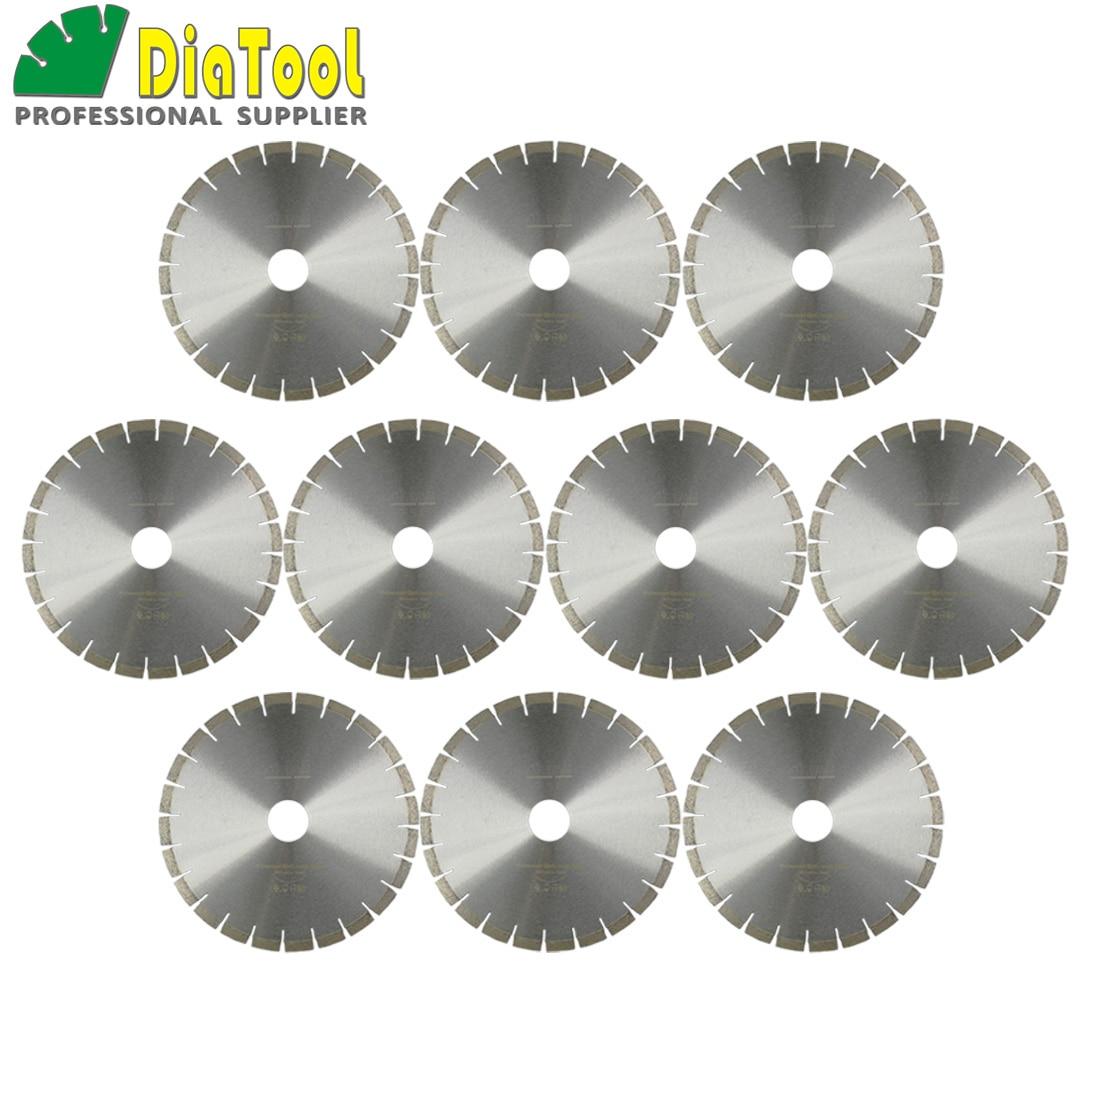 "DIATOOL 10pcs 14"" Diamond Silent Saw Blade Sandwich Steel Core Cutting Disc Bore 60mm Granite Blade Diamond Wheel Disk"